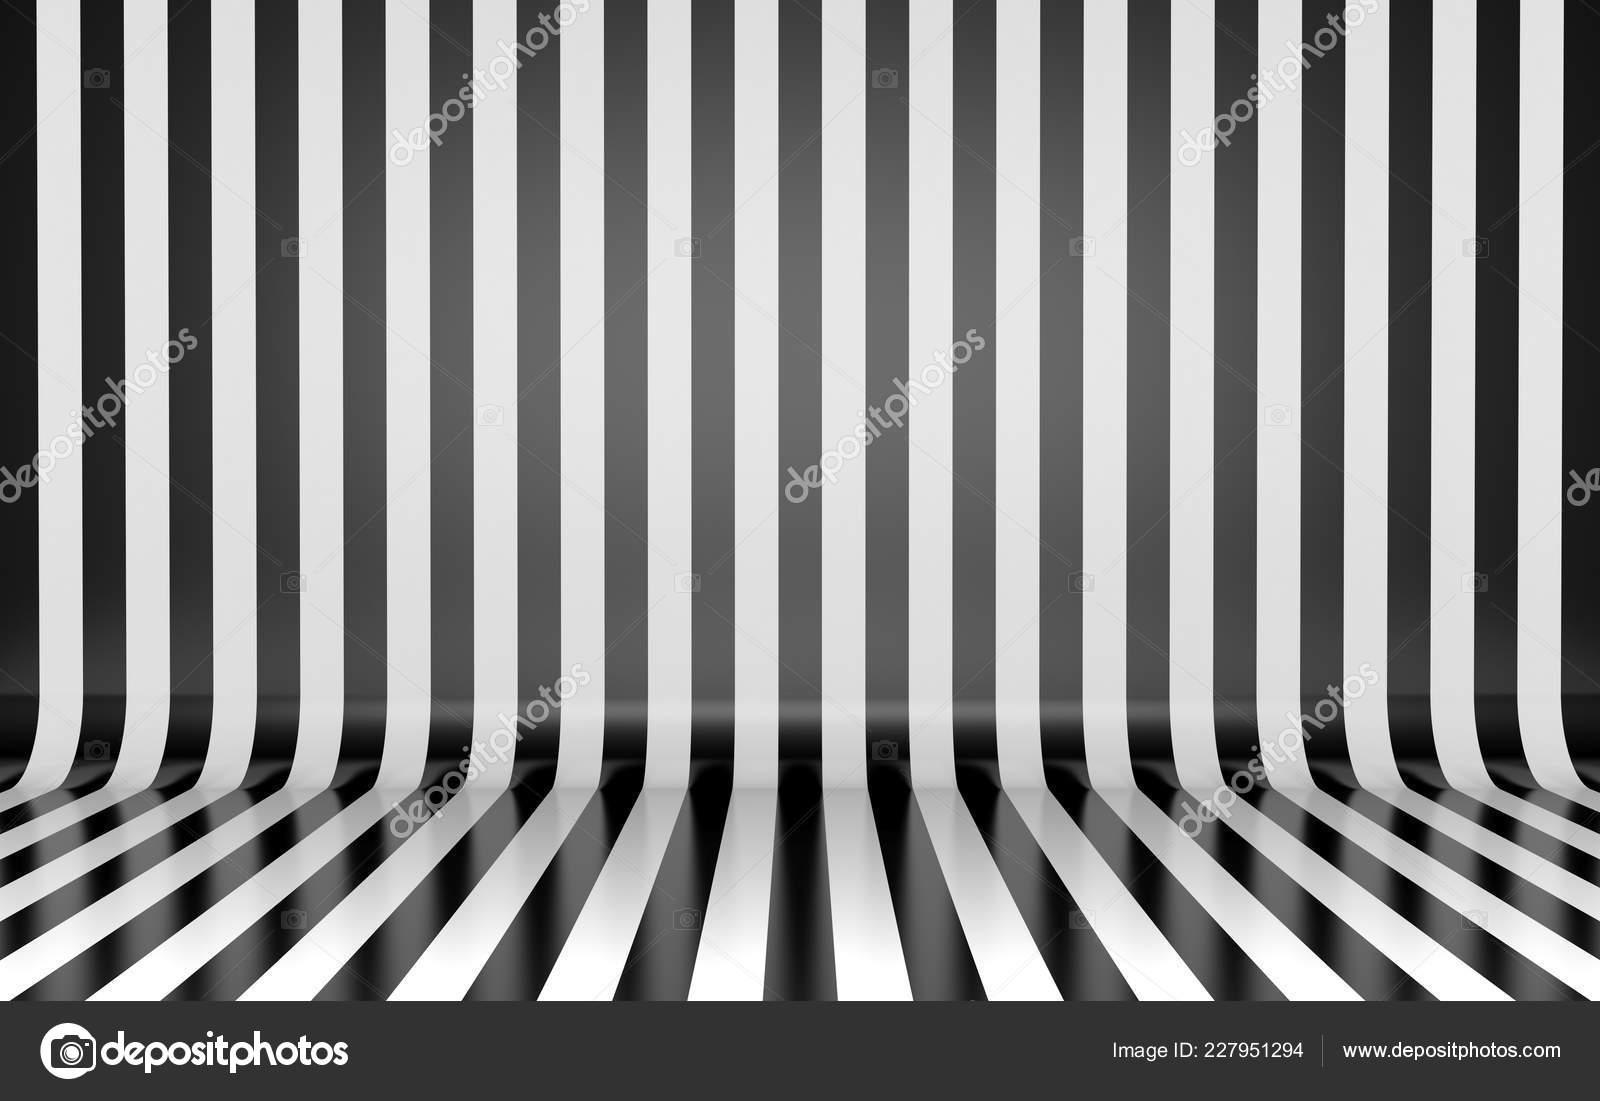 Black White Vertical Lines Wall Floor Studio Background Stock